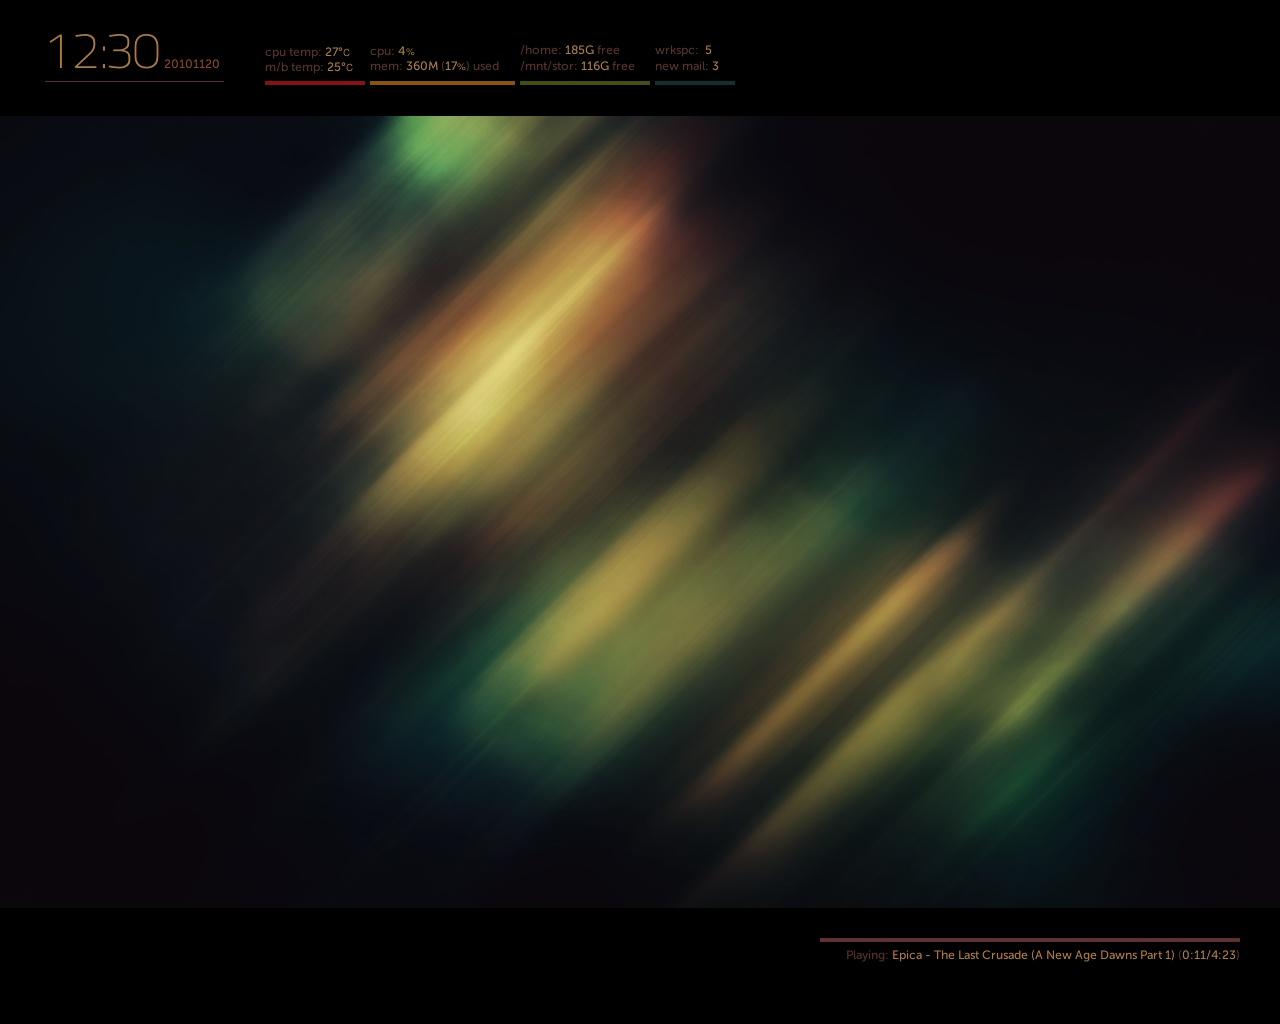 Screenshot-20101120-1 by thebodzio